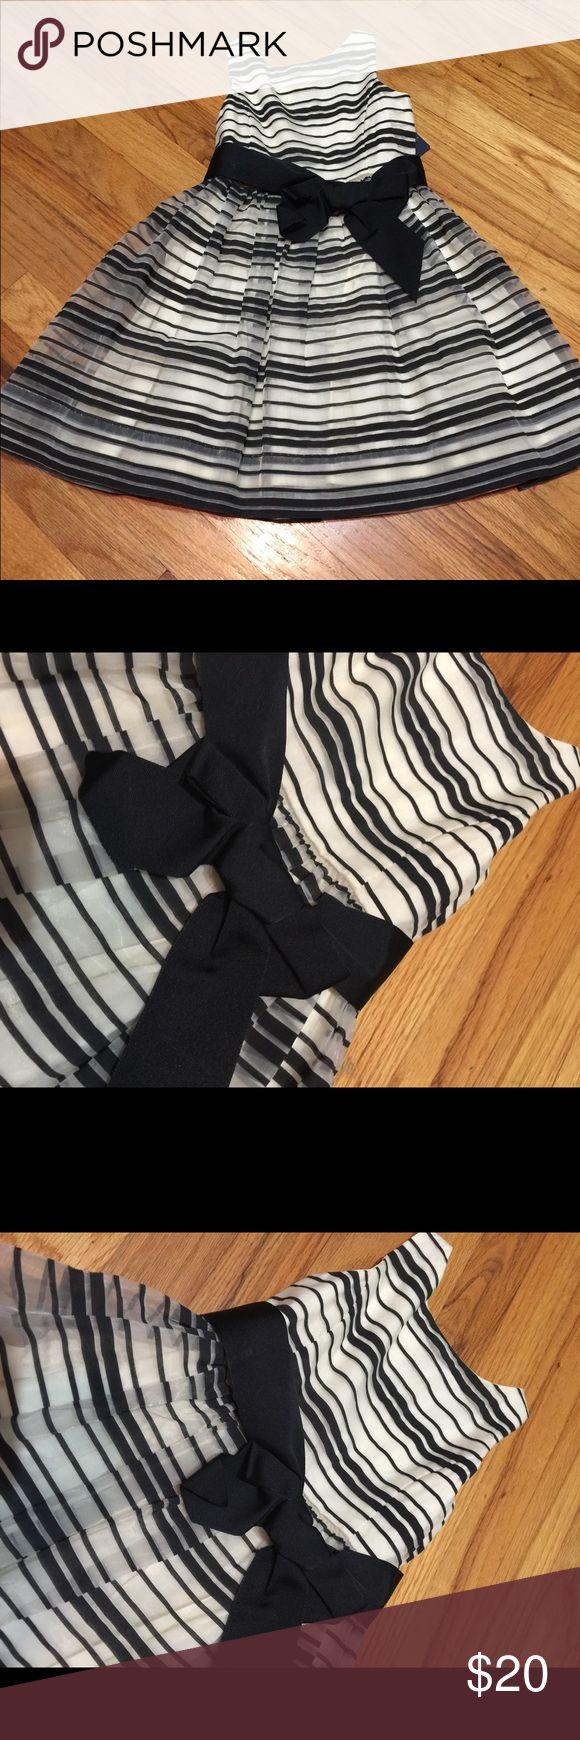 Ralph Lauren girls white with black striped dress Ralph Lauren.Toddler girls white with black striped formal dress. Brand new, never worn. Ralph Lauren Dresses Formal